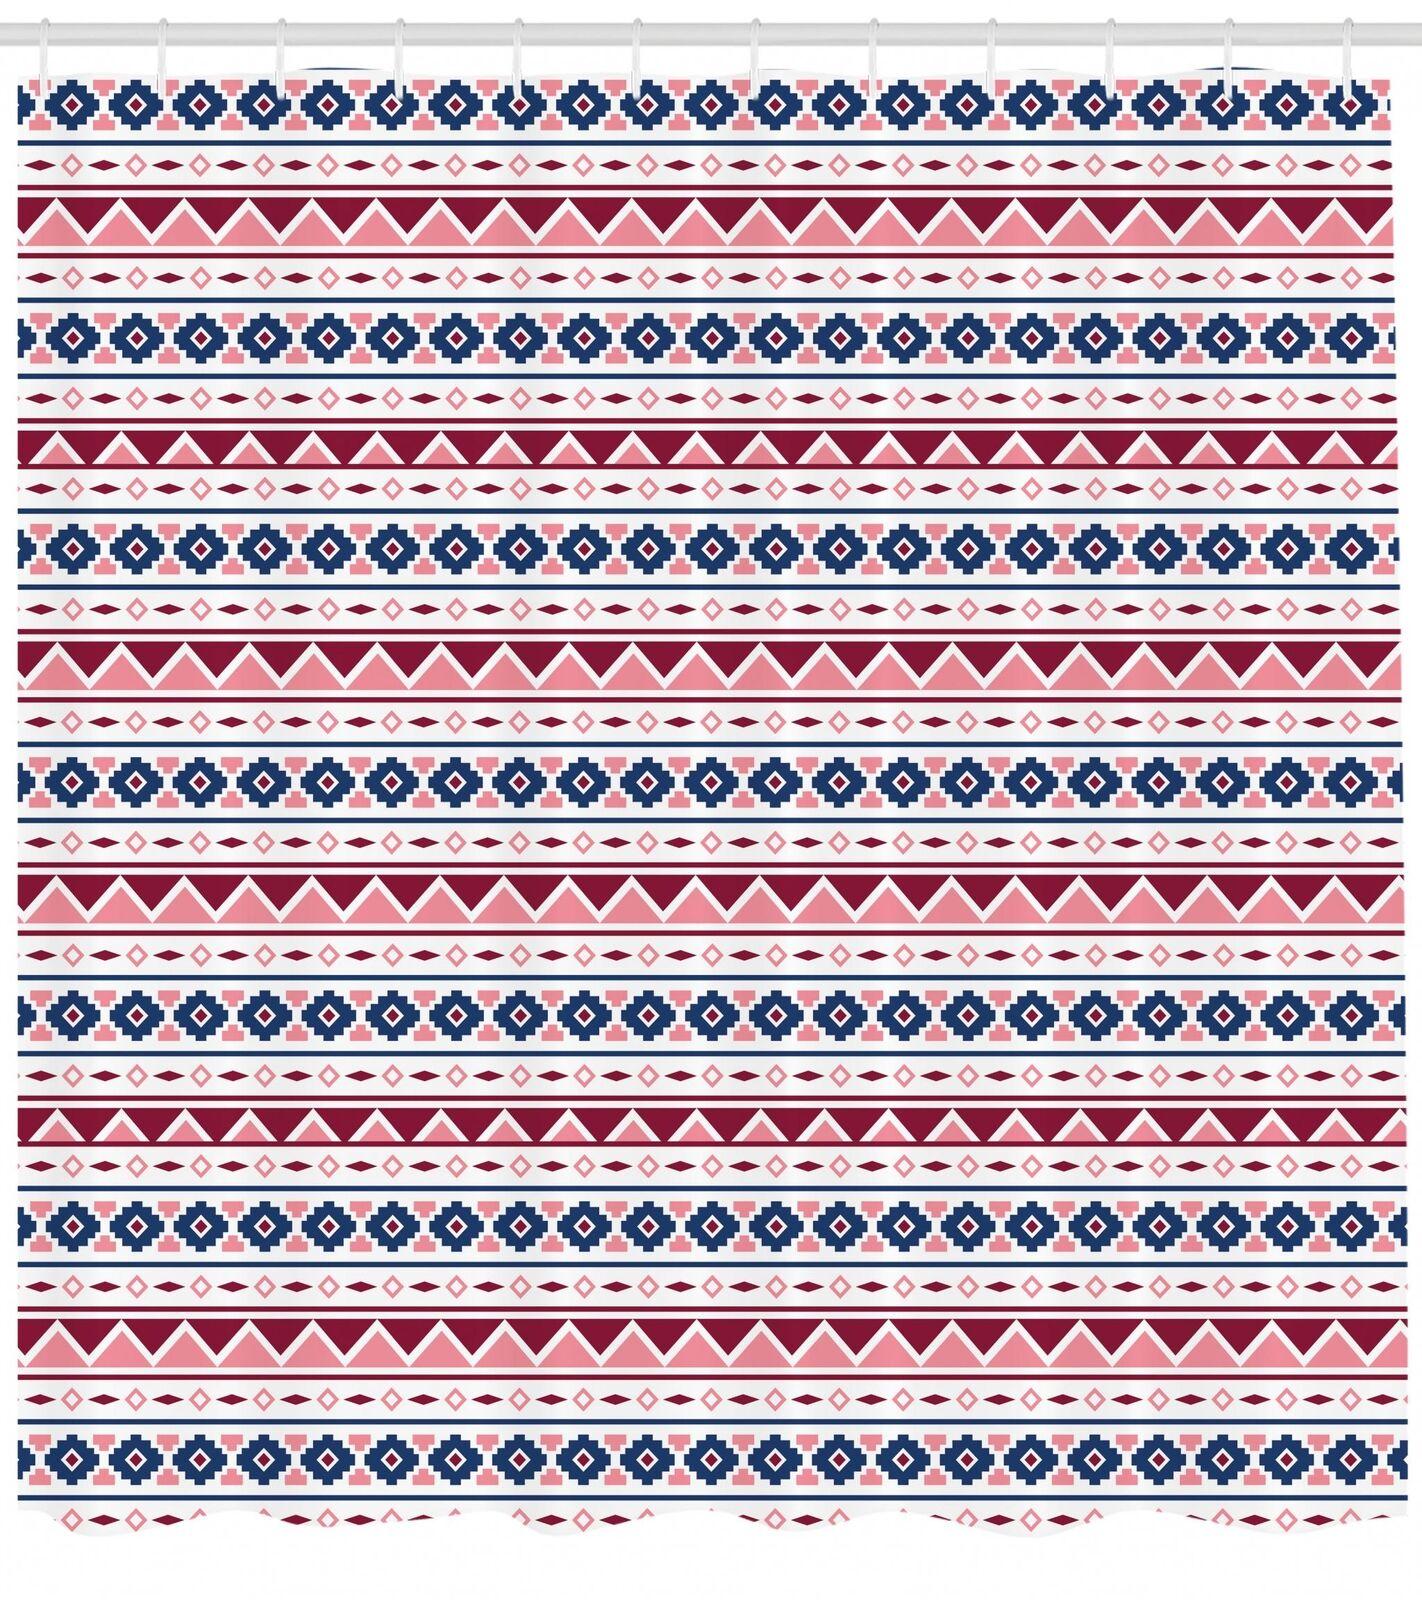 Timeless Oriental Pattern Shower Curtain Fabric Decor Set with Hooks 4 Größes